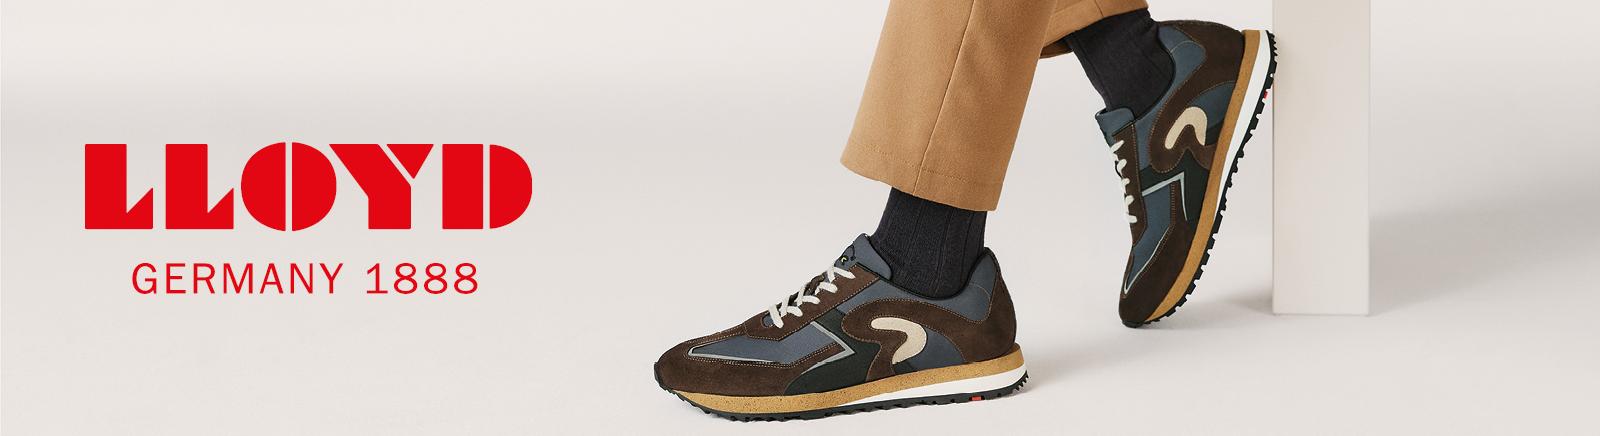 Prange: LLOYD Sneaker für Herren online shoppen